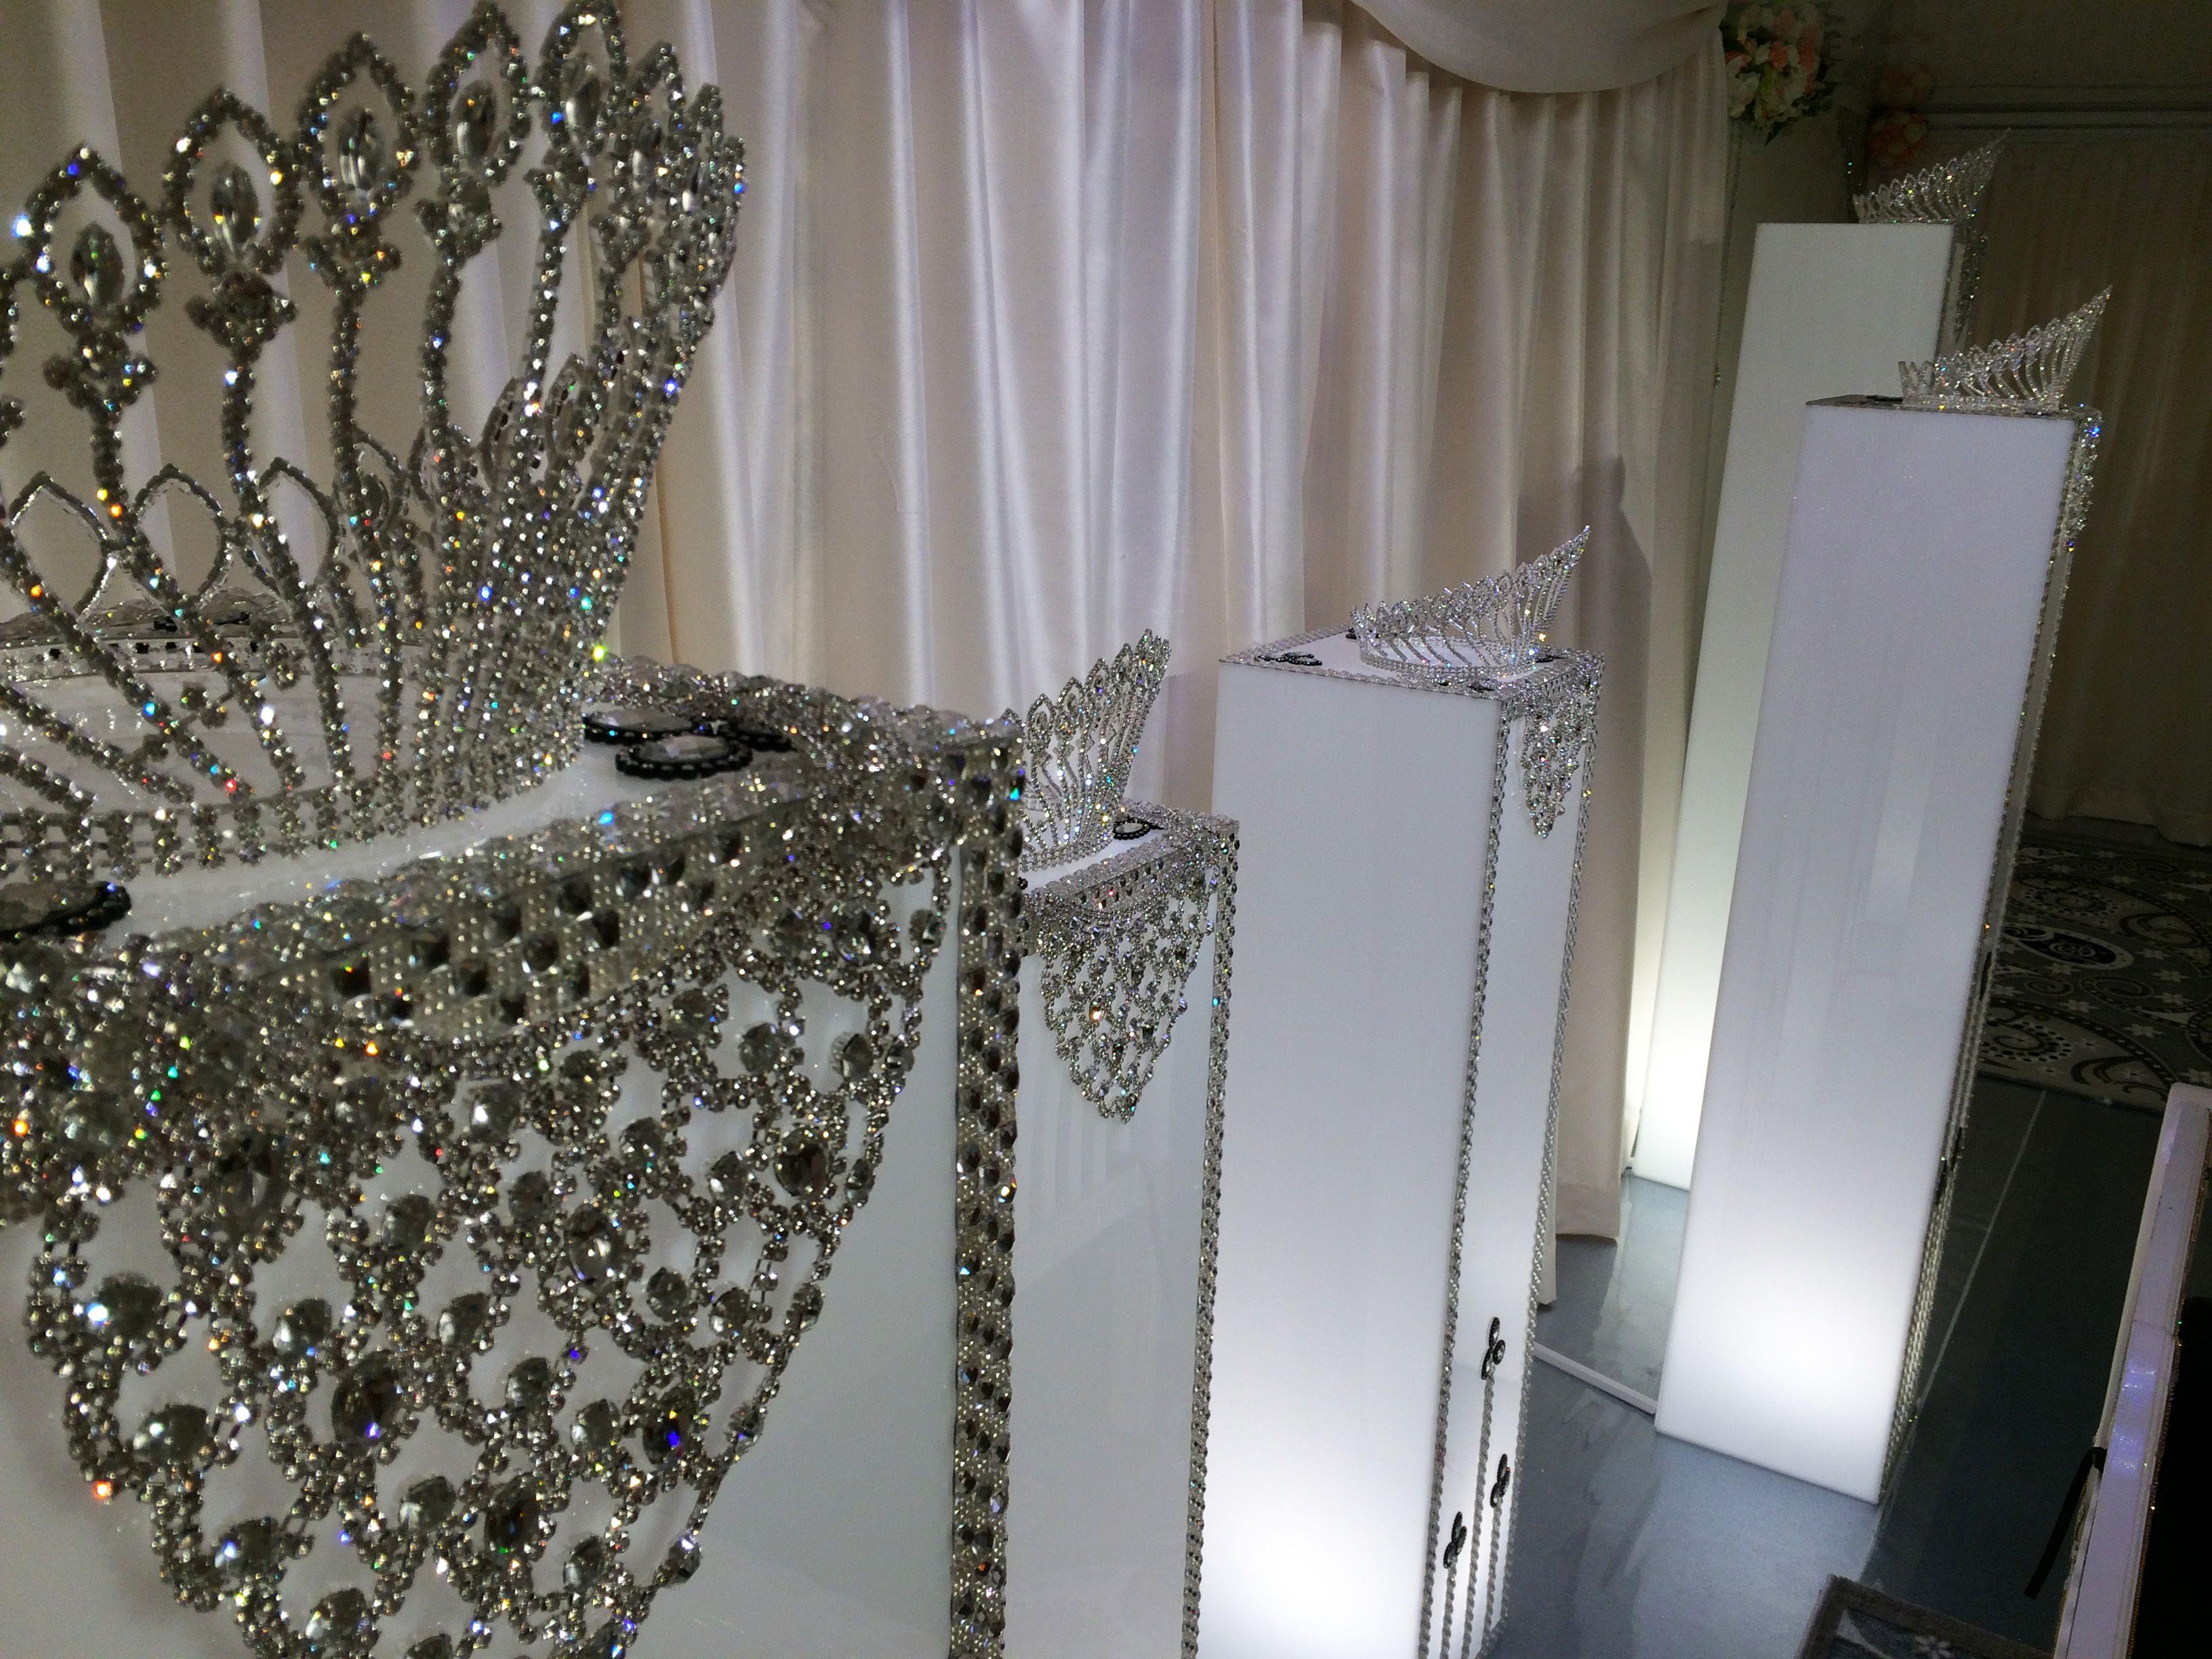 Stylish! #Lagunsari #wedding Love #catering #cater #event #function #love @lagunsarilove #new #newlook #style #crown #glory Crowningglory #theme #diamonds #shine #malaywedding #halal #malay #eat #blissful #bliss